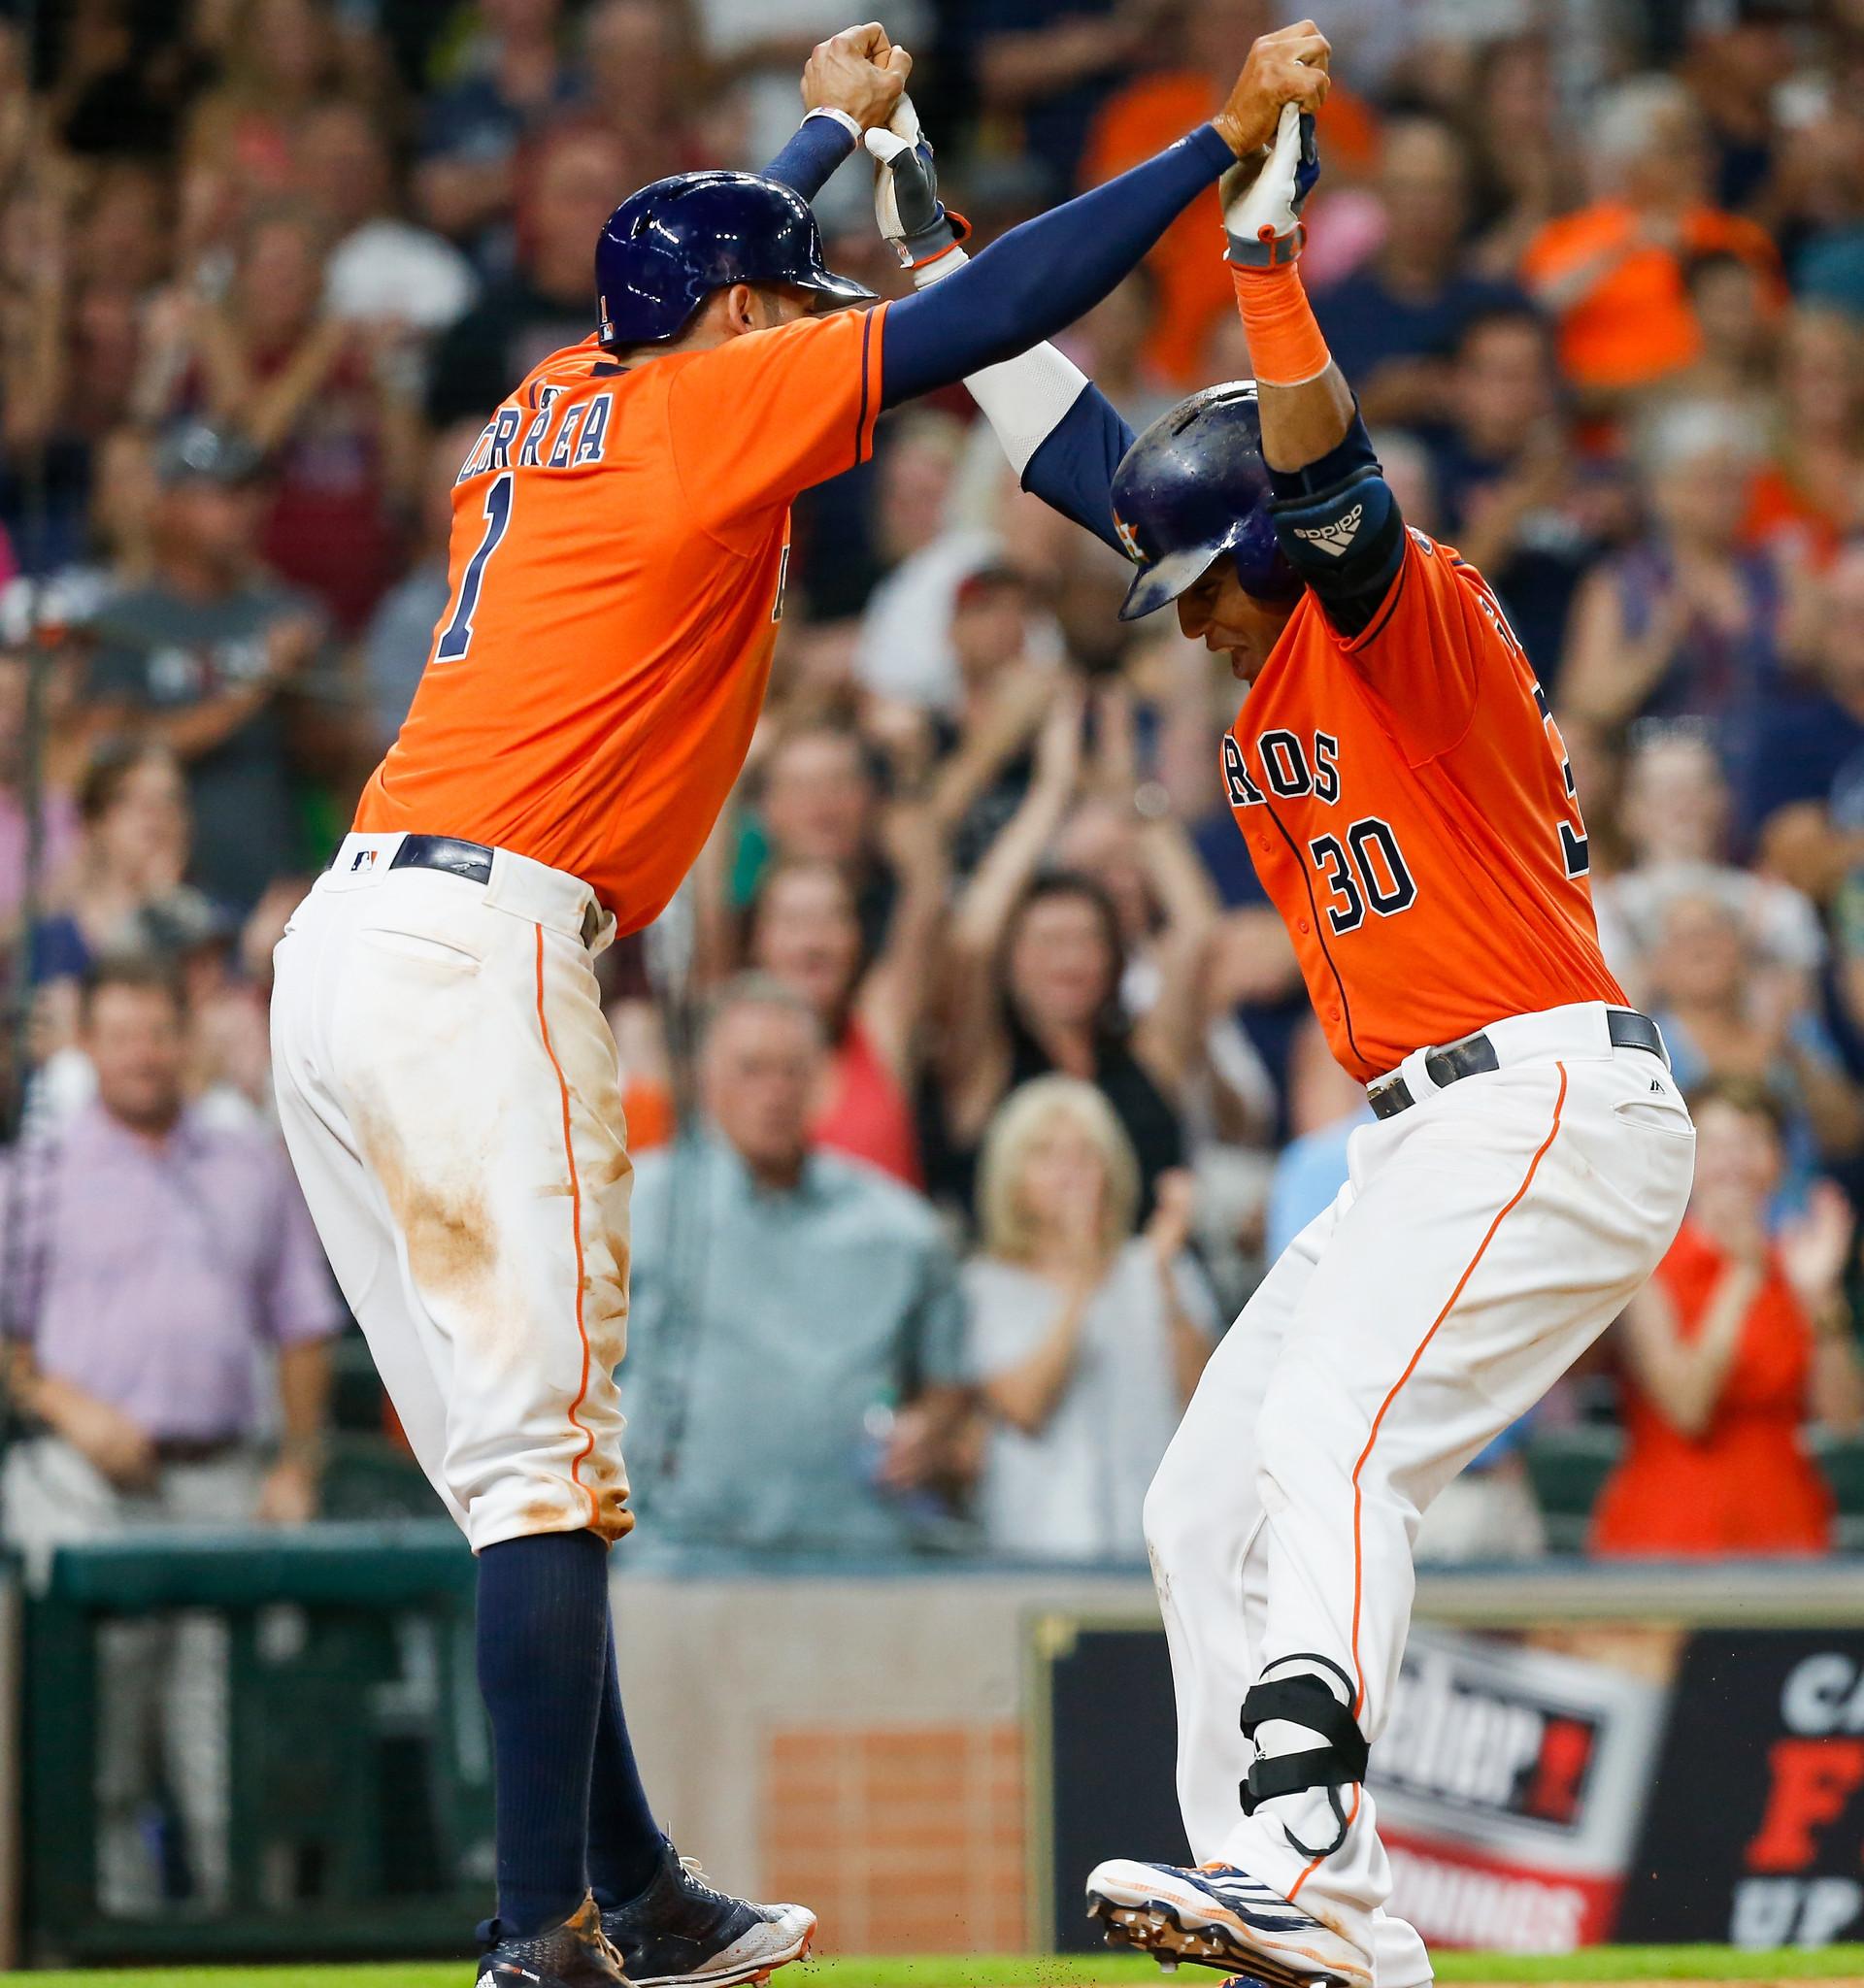 Friday's Recap: Astros 5, White Sox 0